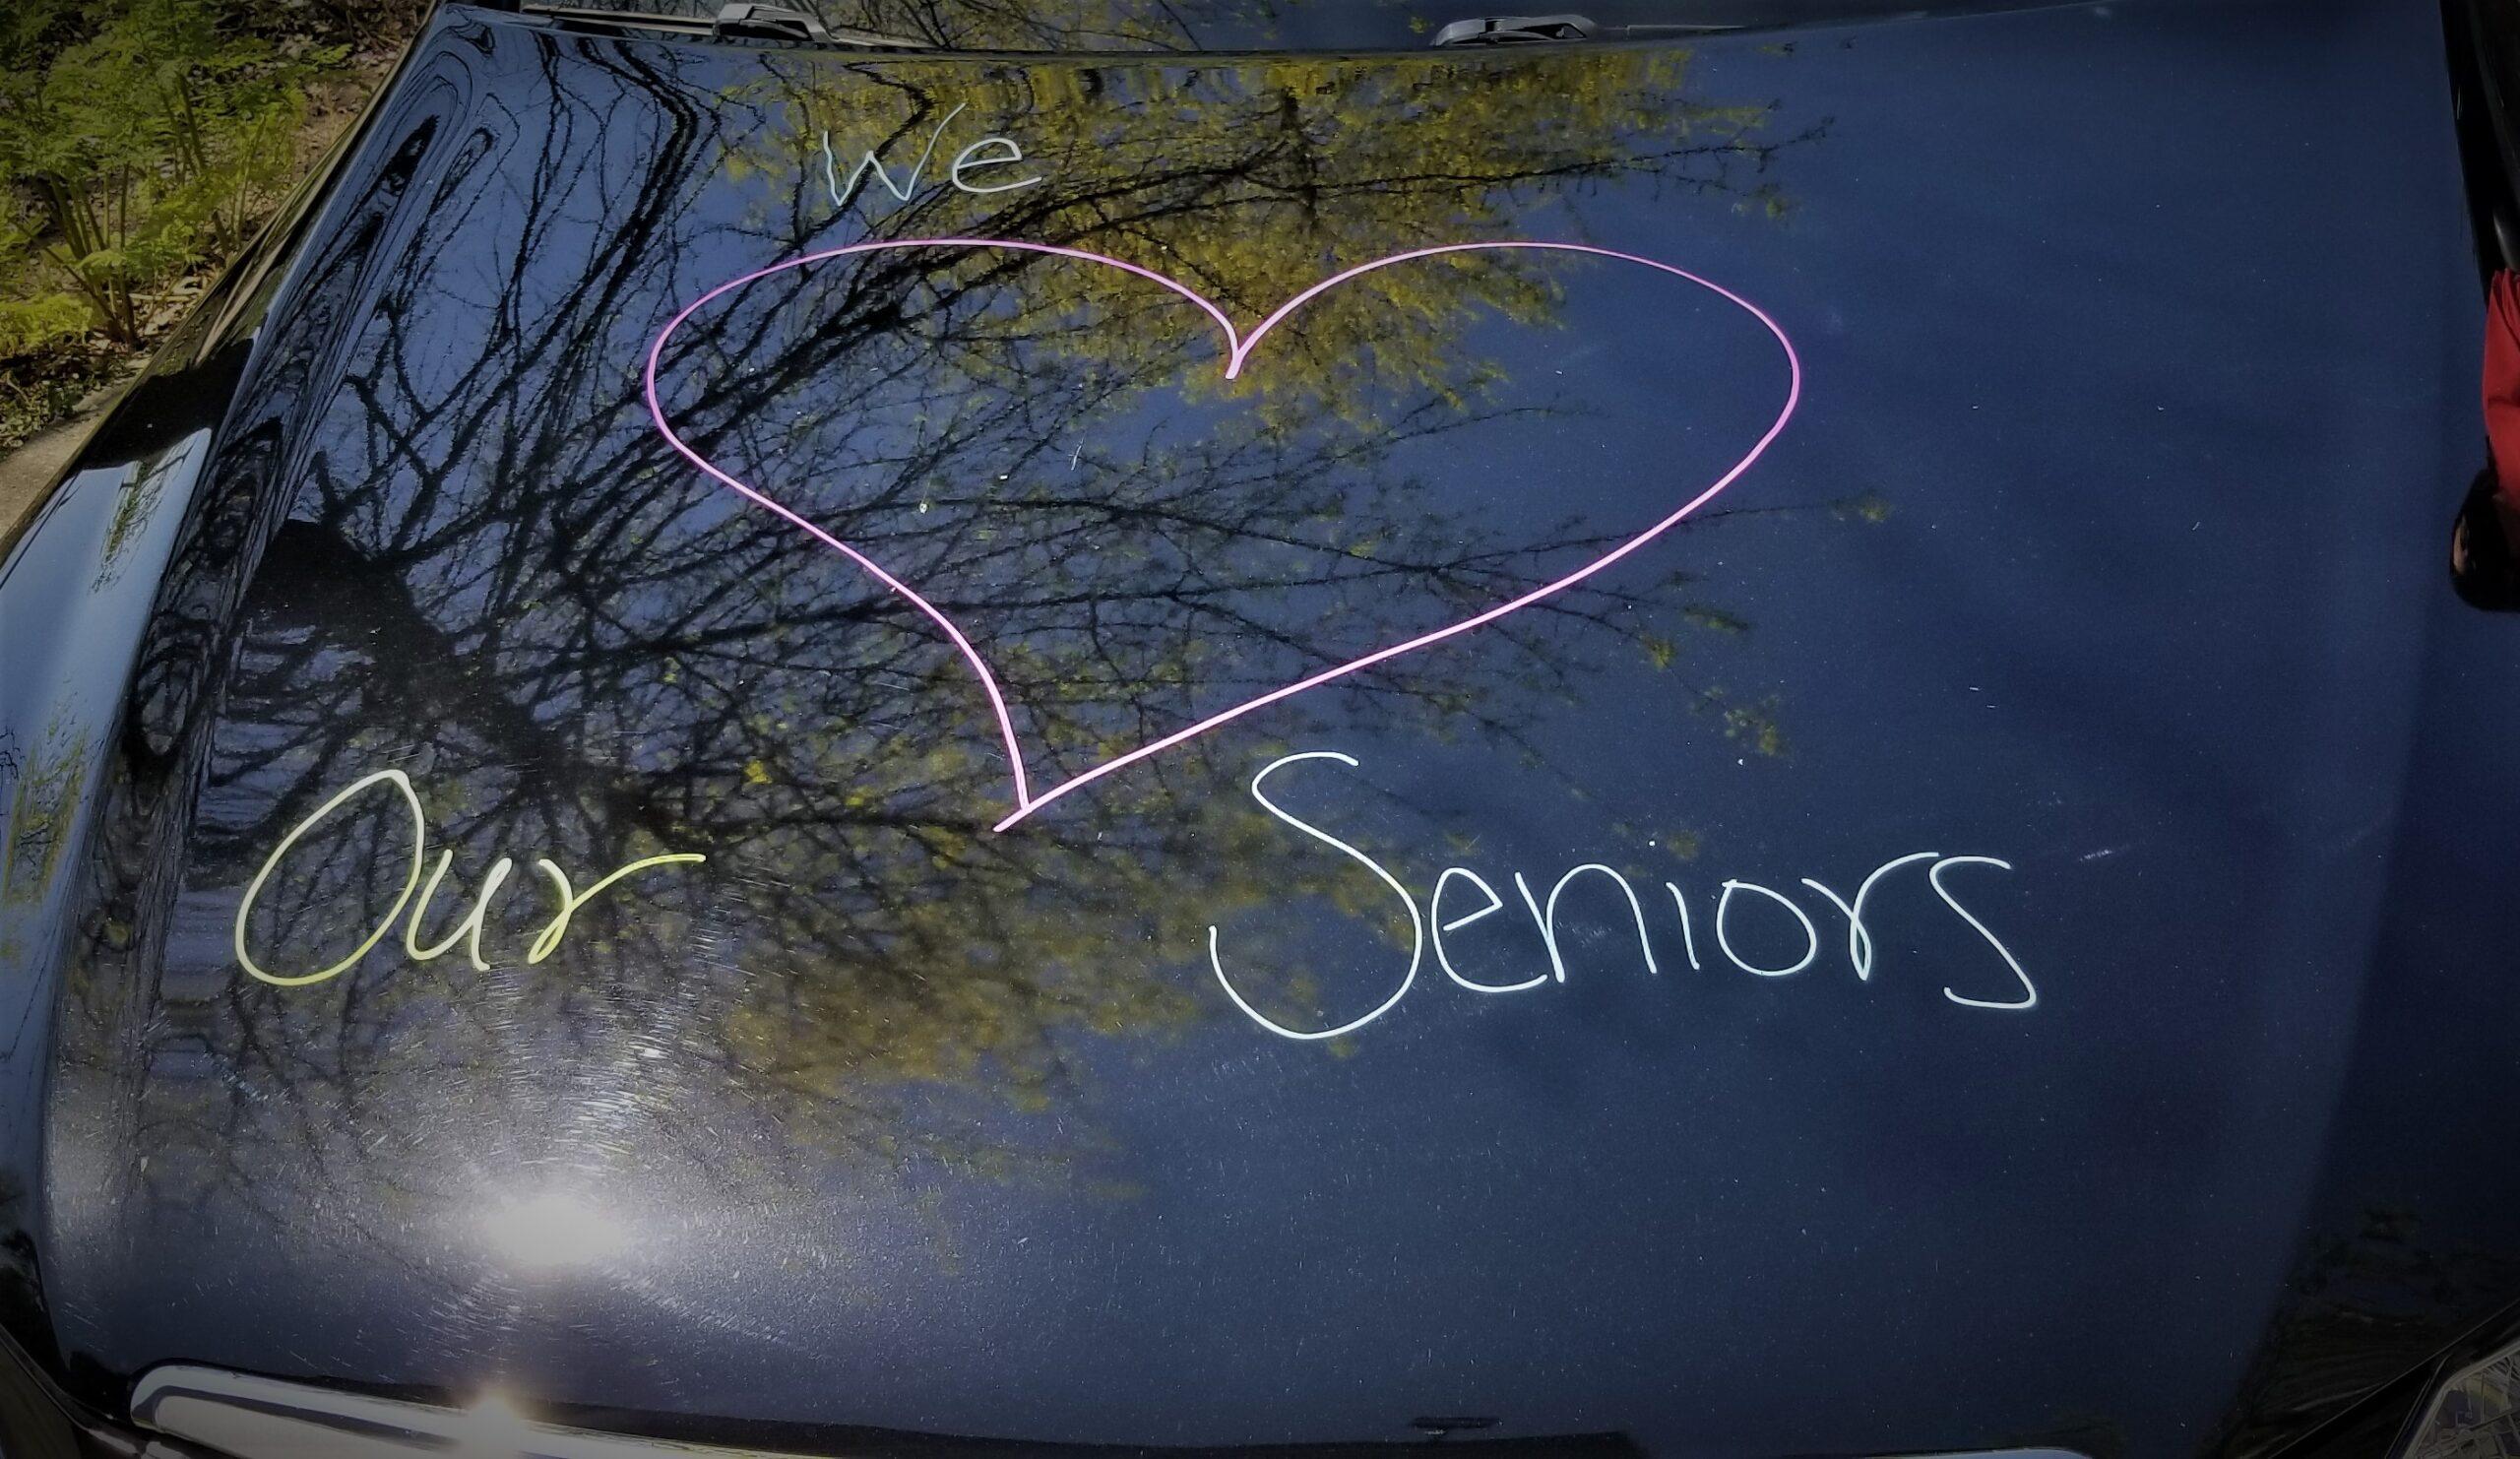 senior center parade, drive by parade, cr parade, auburn seniors, auburn wa senior parade,